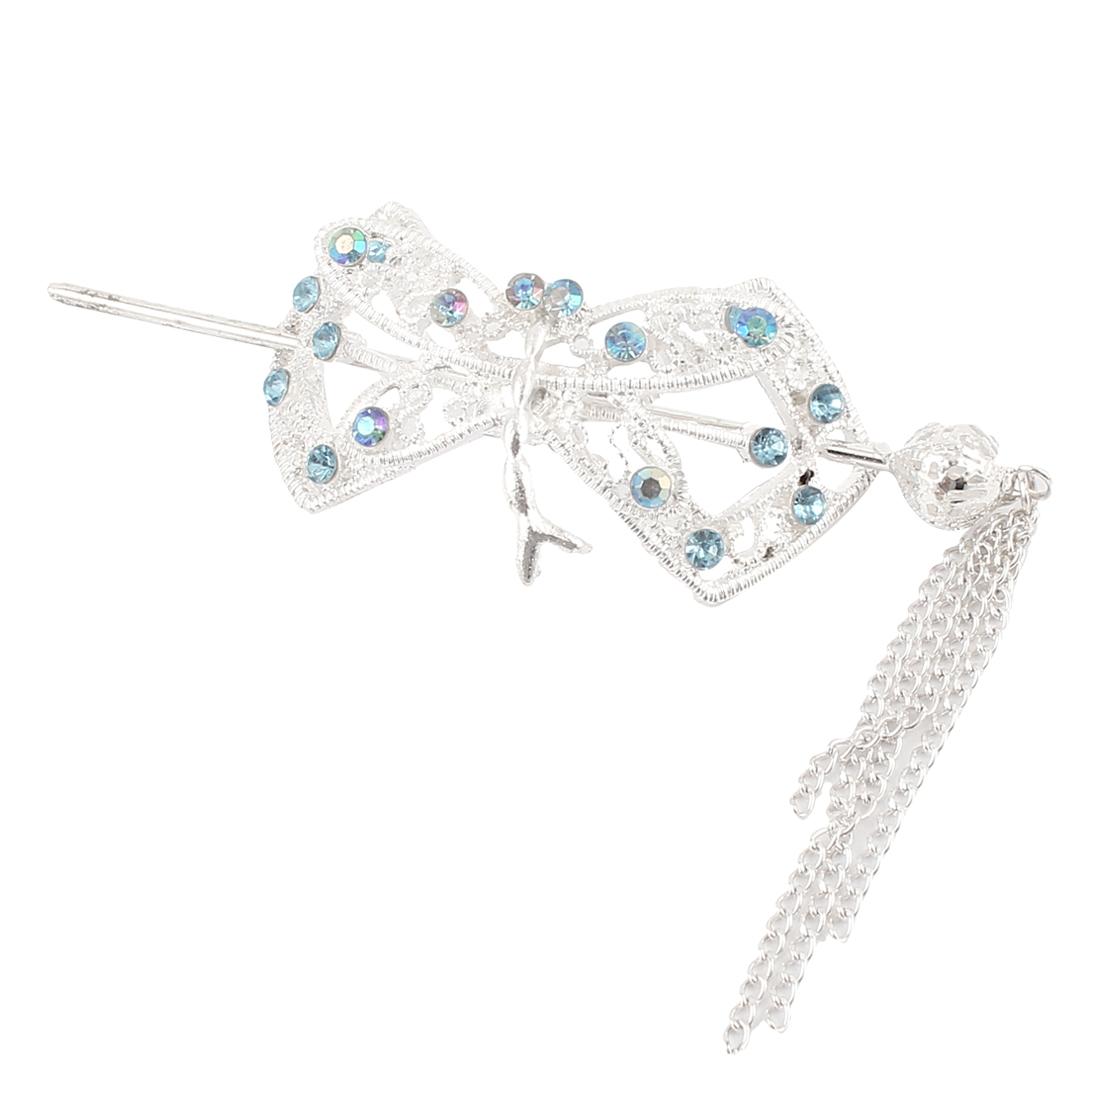 Wedding Teal Rhinestone Inlaid Metallic Ponytail Hairpin Barrette Hair Stick